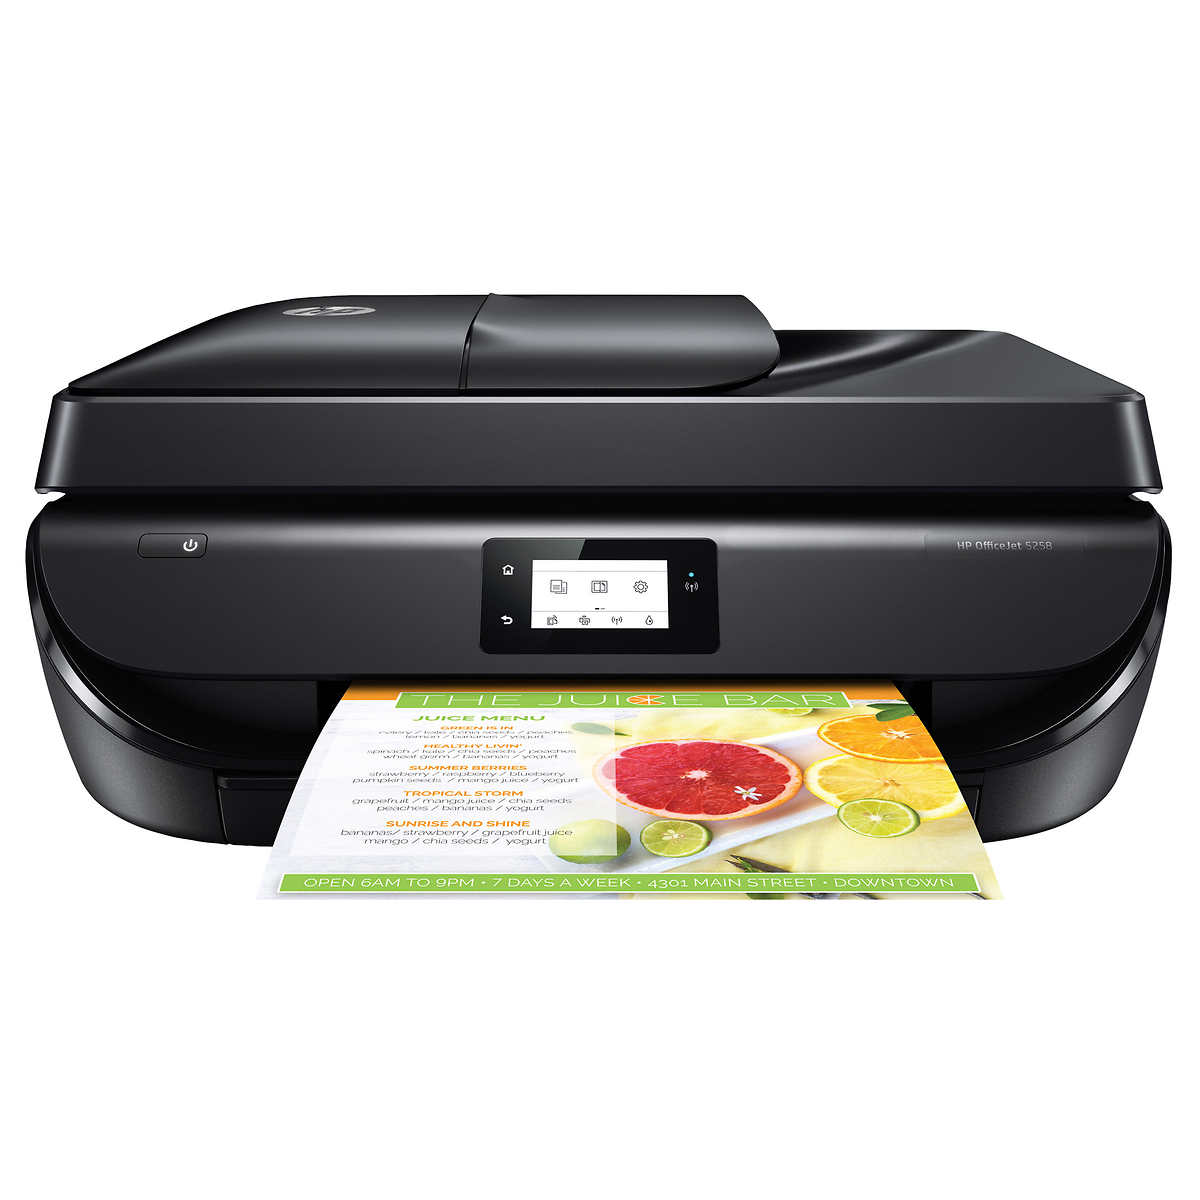 HP OfficeJet 5258 All-in-One Wireless Printer